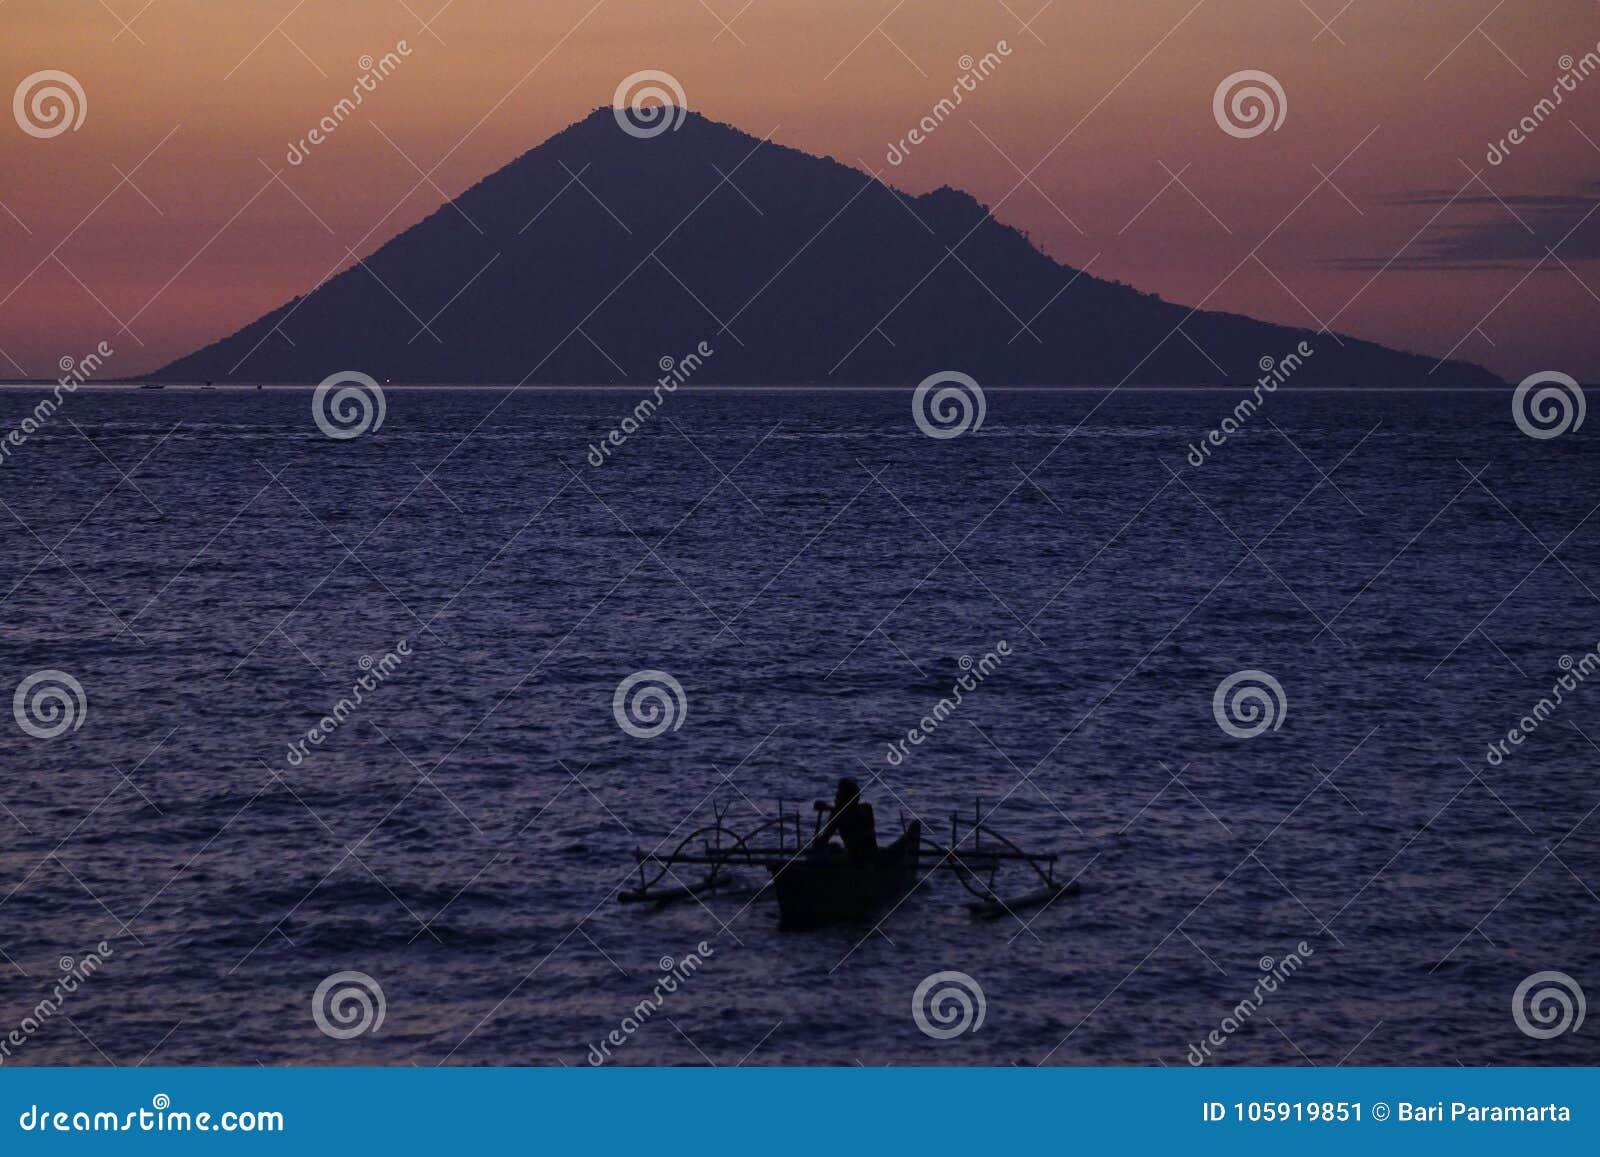 Fisherman Alone with background of Manado Tua Island